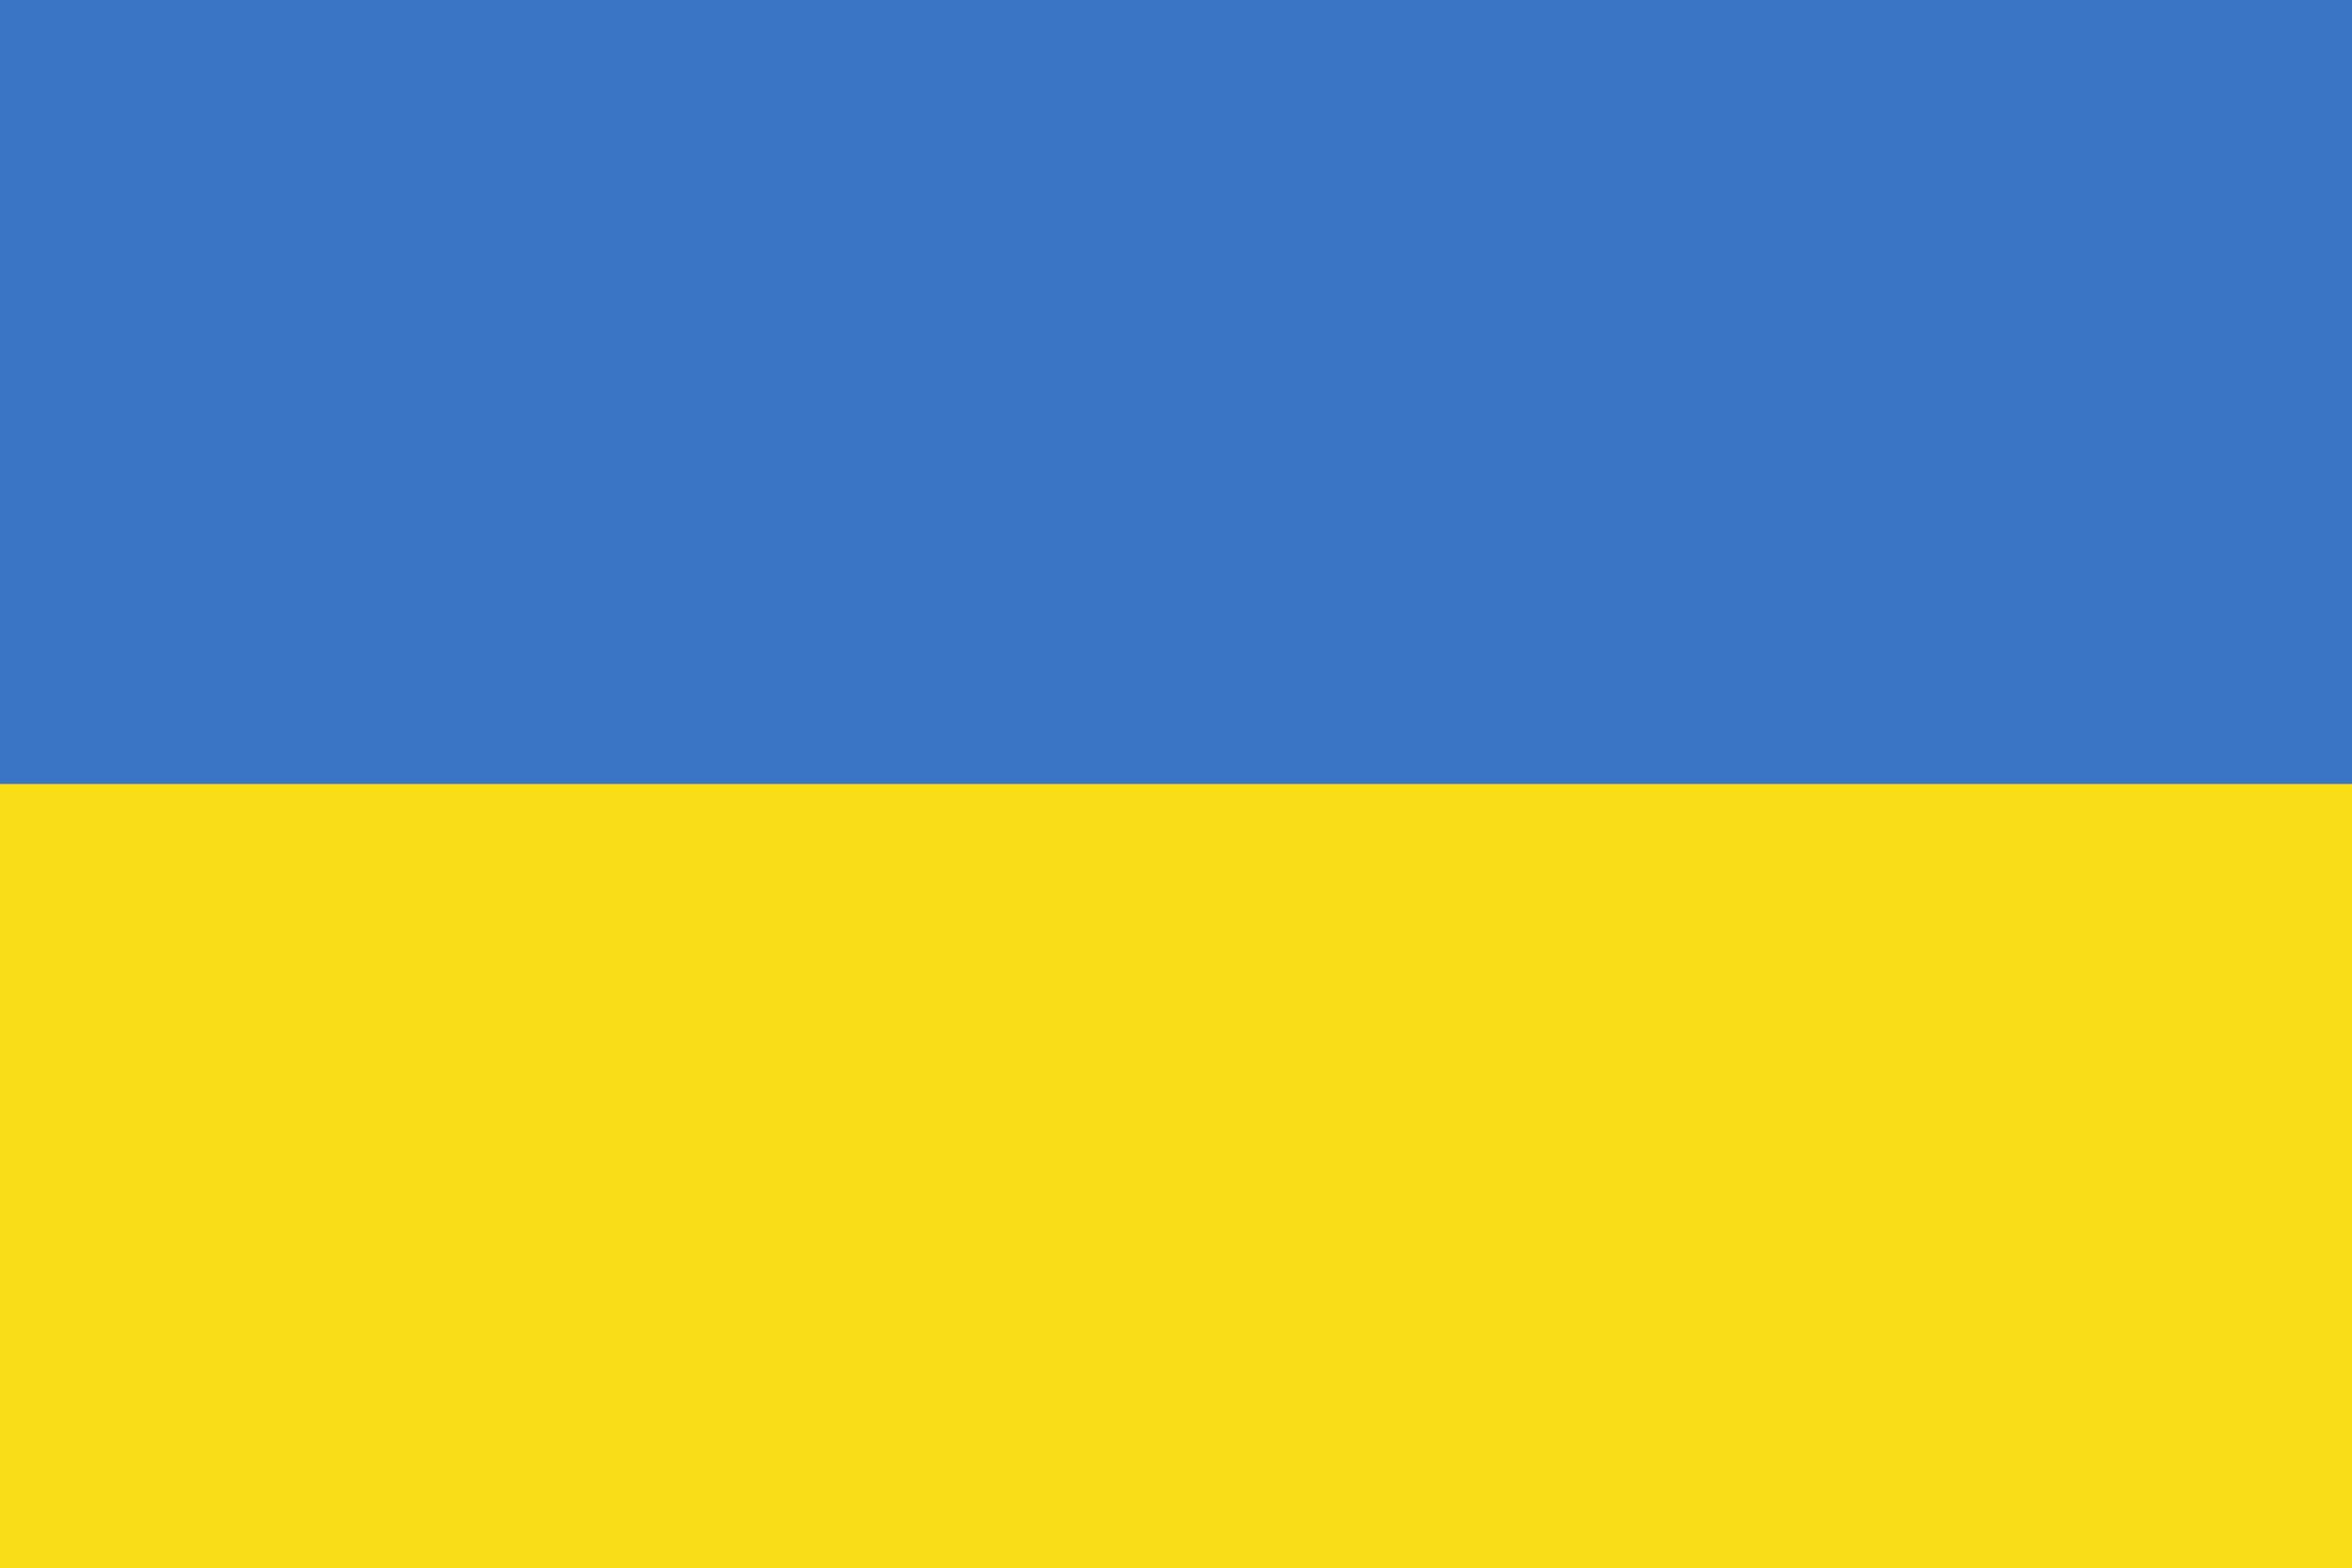 Amazing Flag Of Ukraine Pictures & Backgrounds